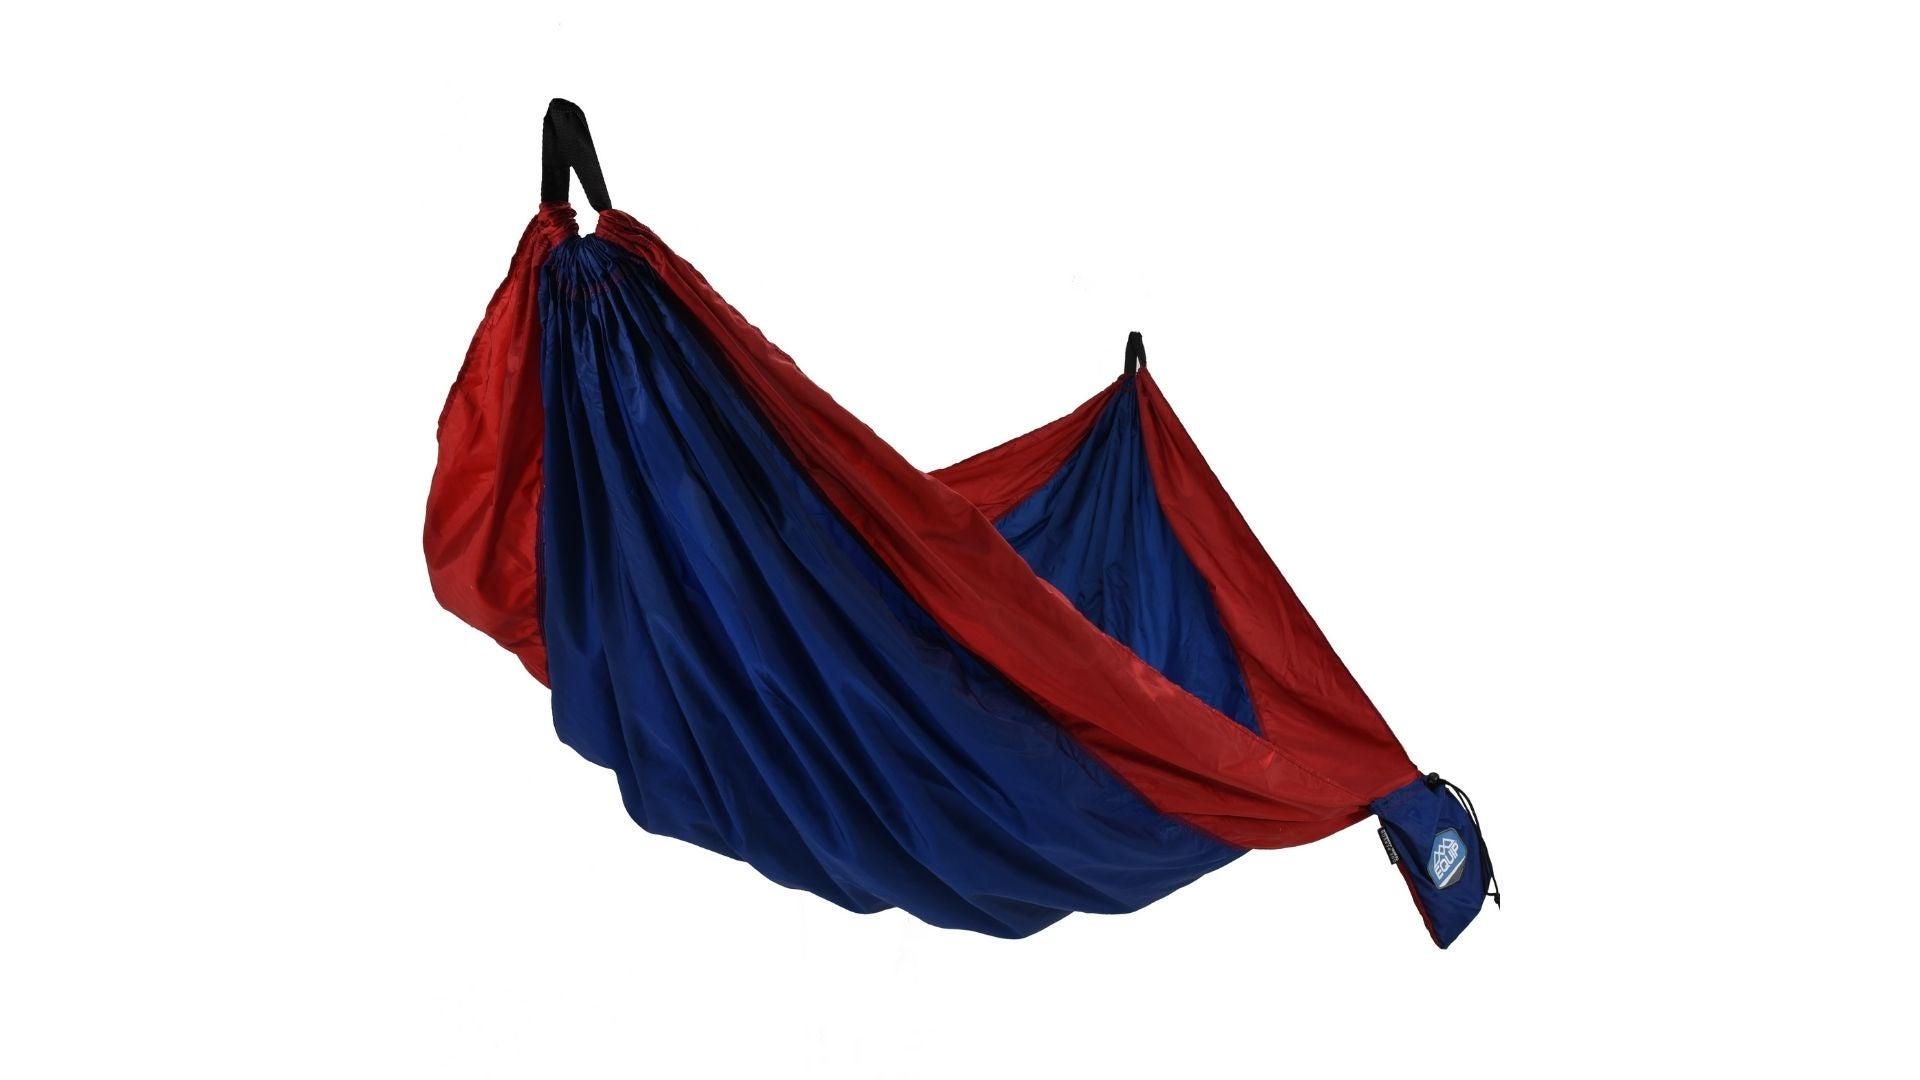 Equip Lightweight Portable Nylon Camping Travel Hammock